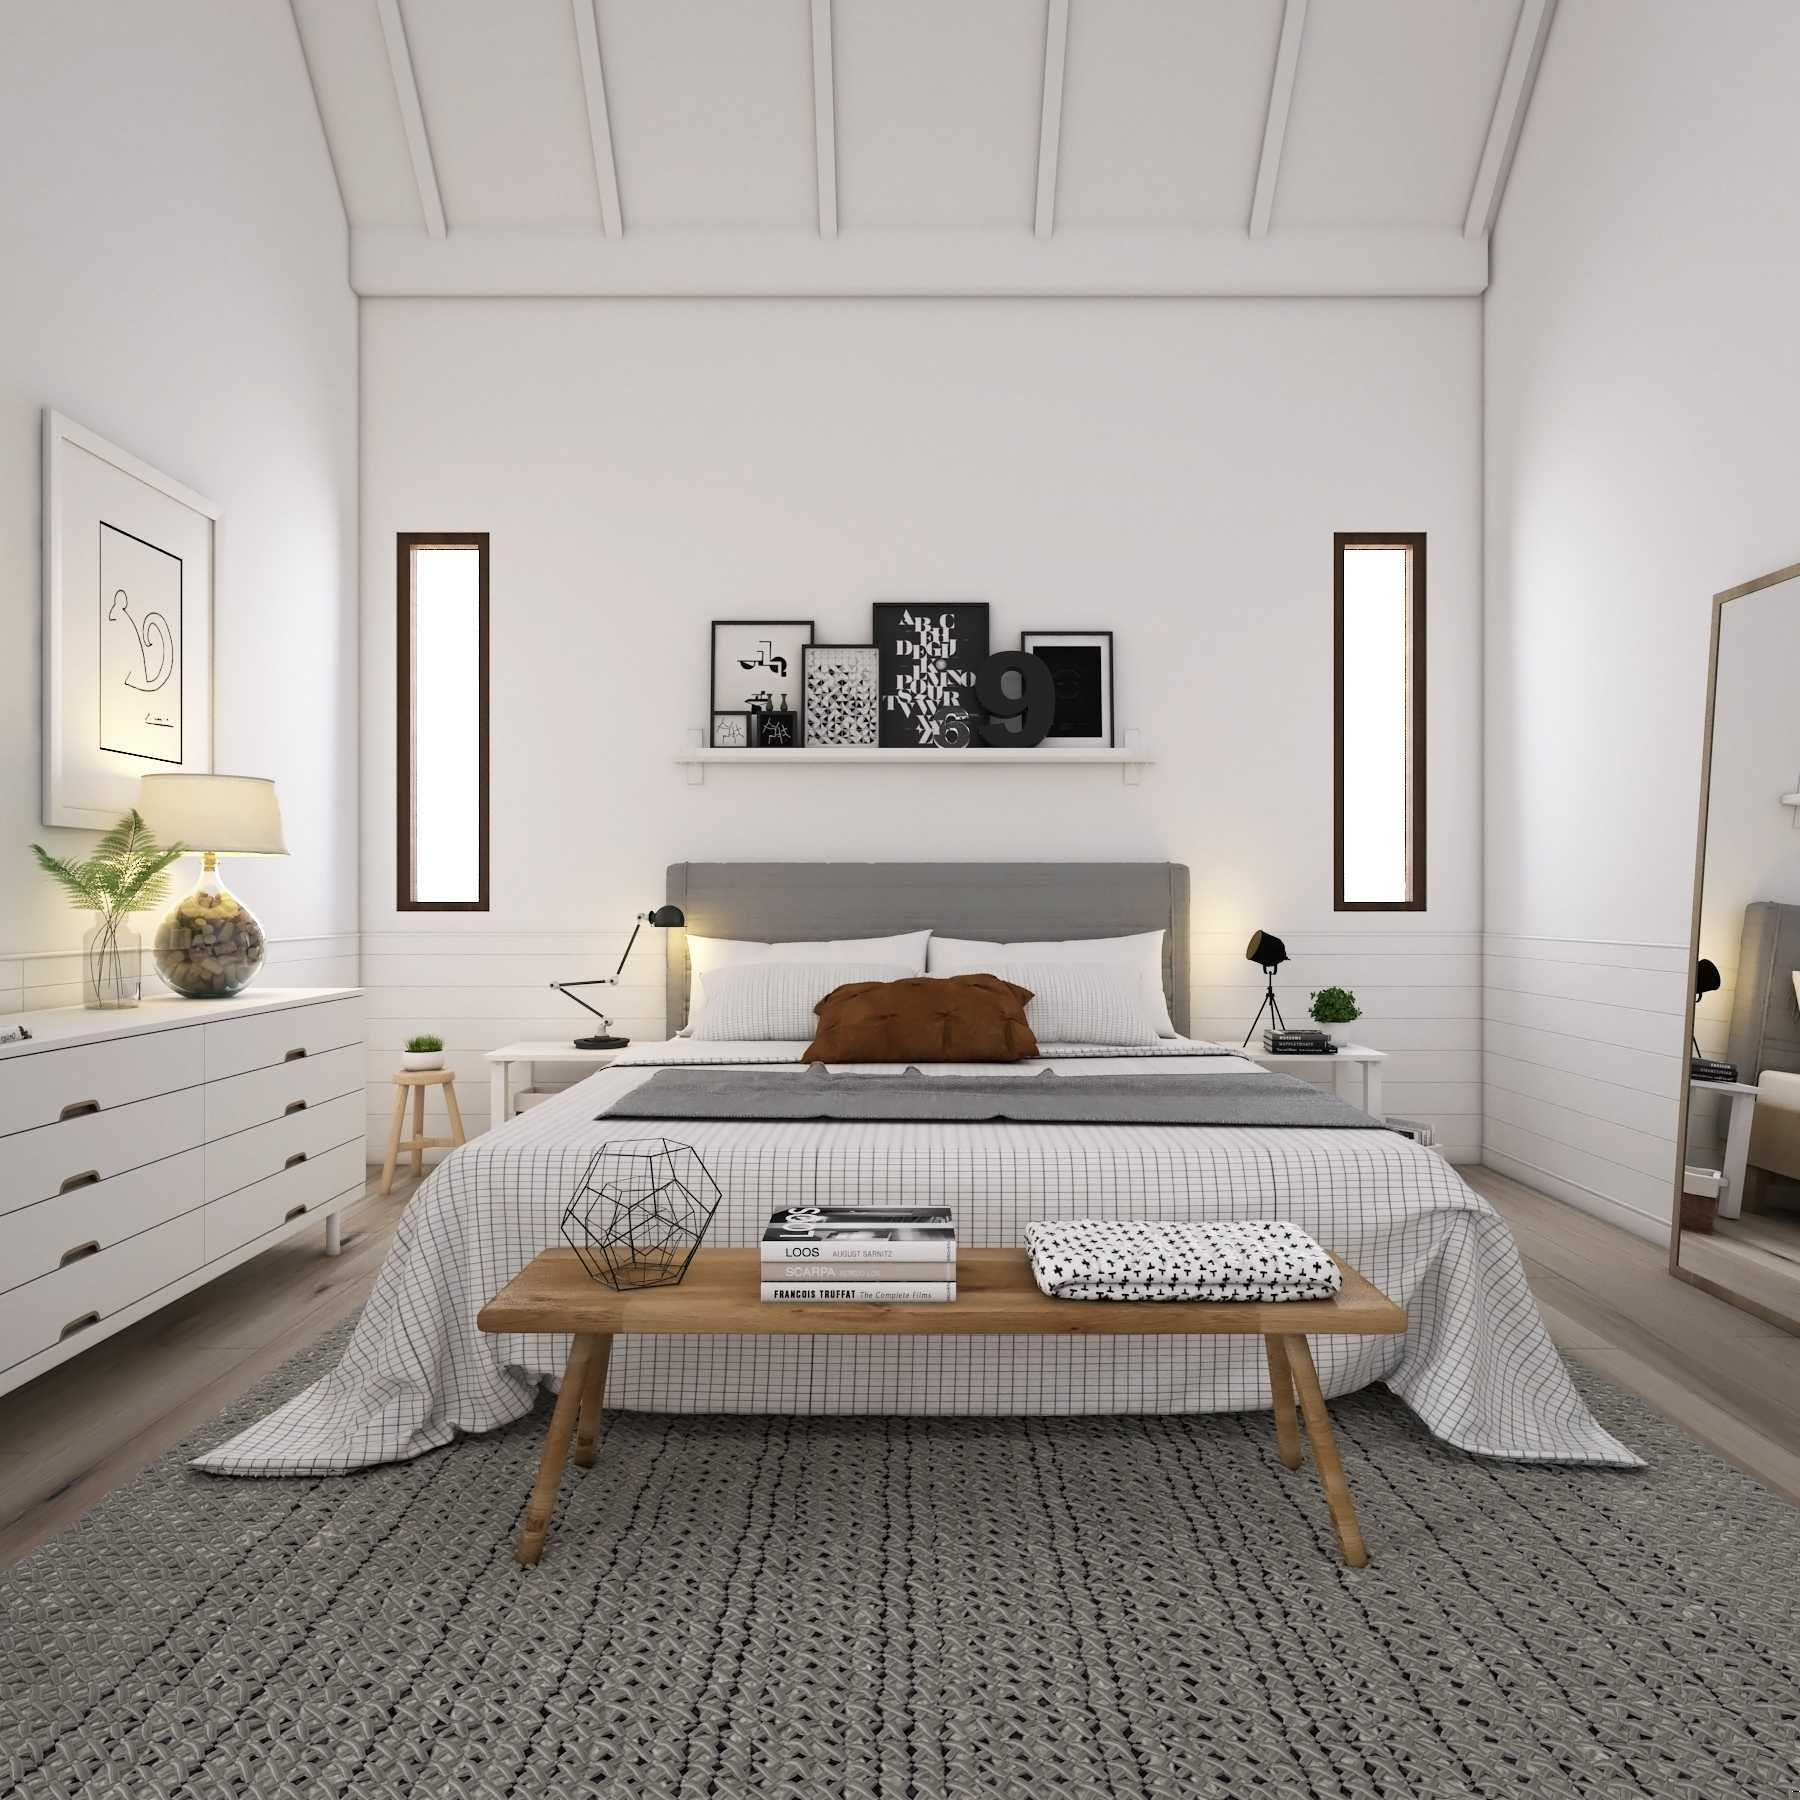 Scandinavia Bedroom Scandinavian House Medan Sumatra Utara La Casa Interior Scandinavian Room Decor Scandinavian Home Interior